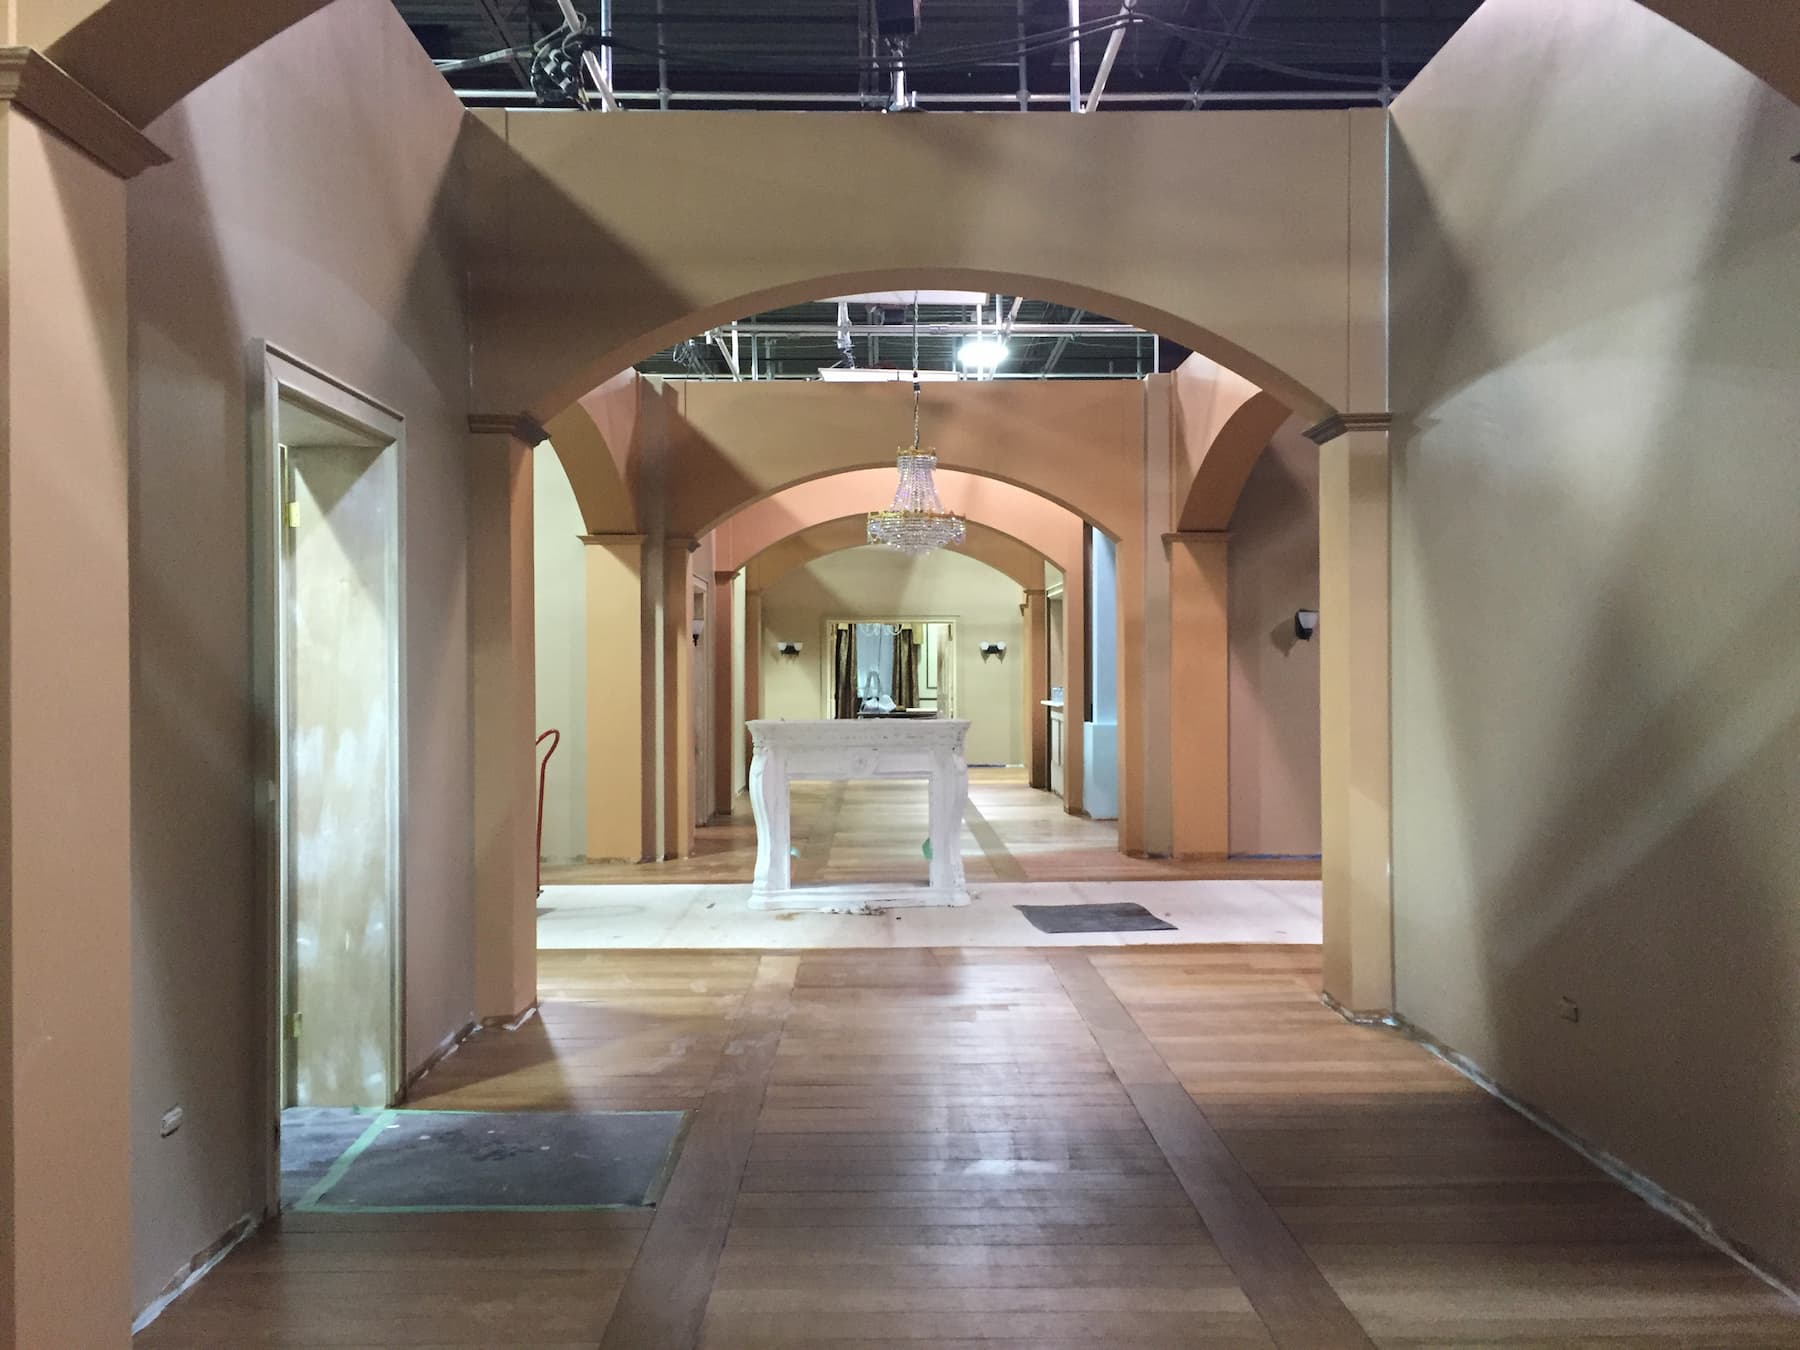 set construction of hallway in big mansion